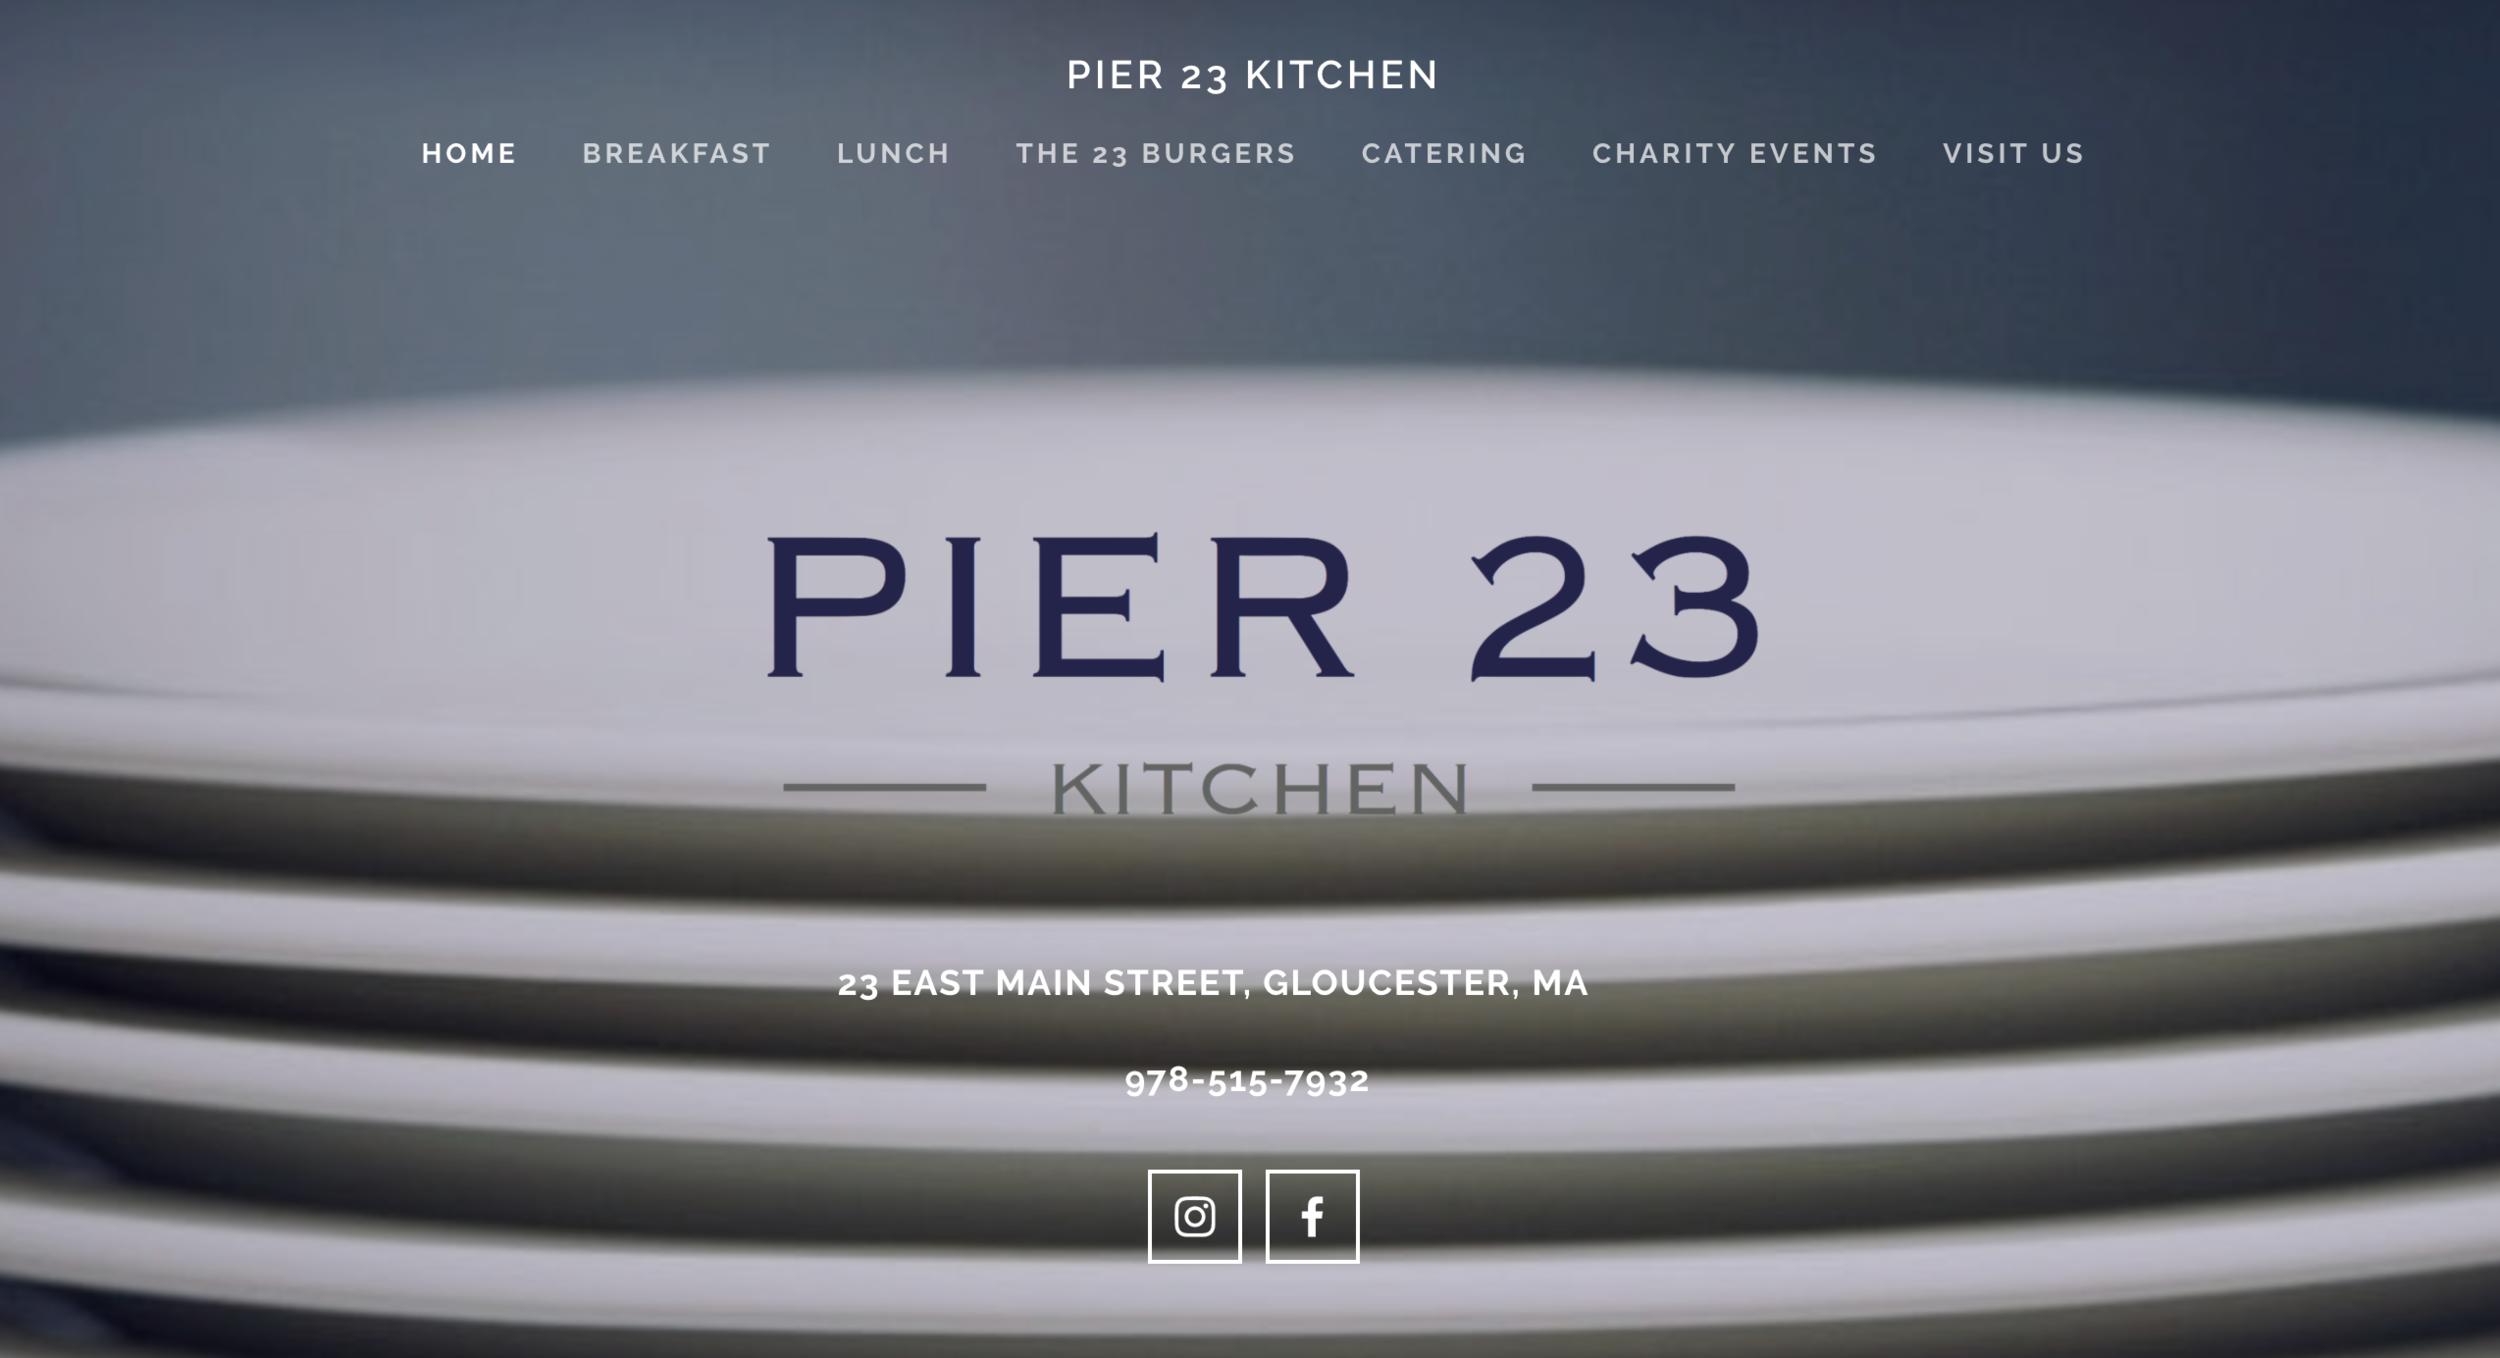 Pier 23 Kitchen, Gloucester, Ma